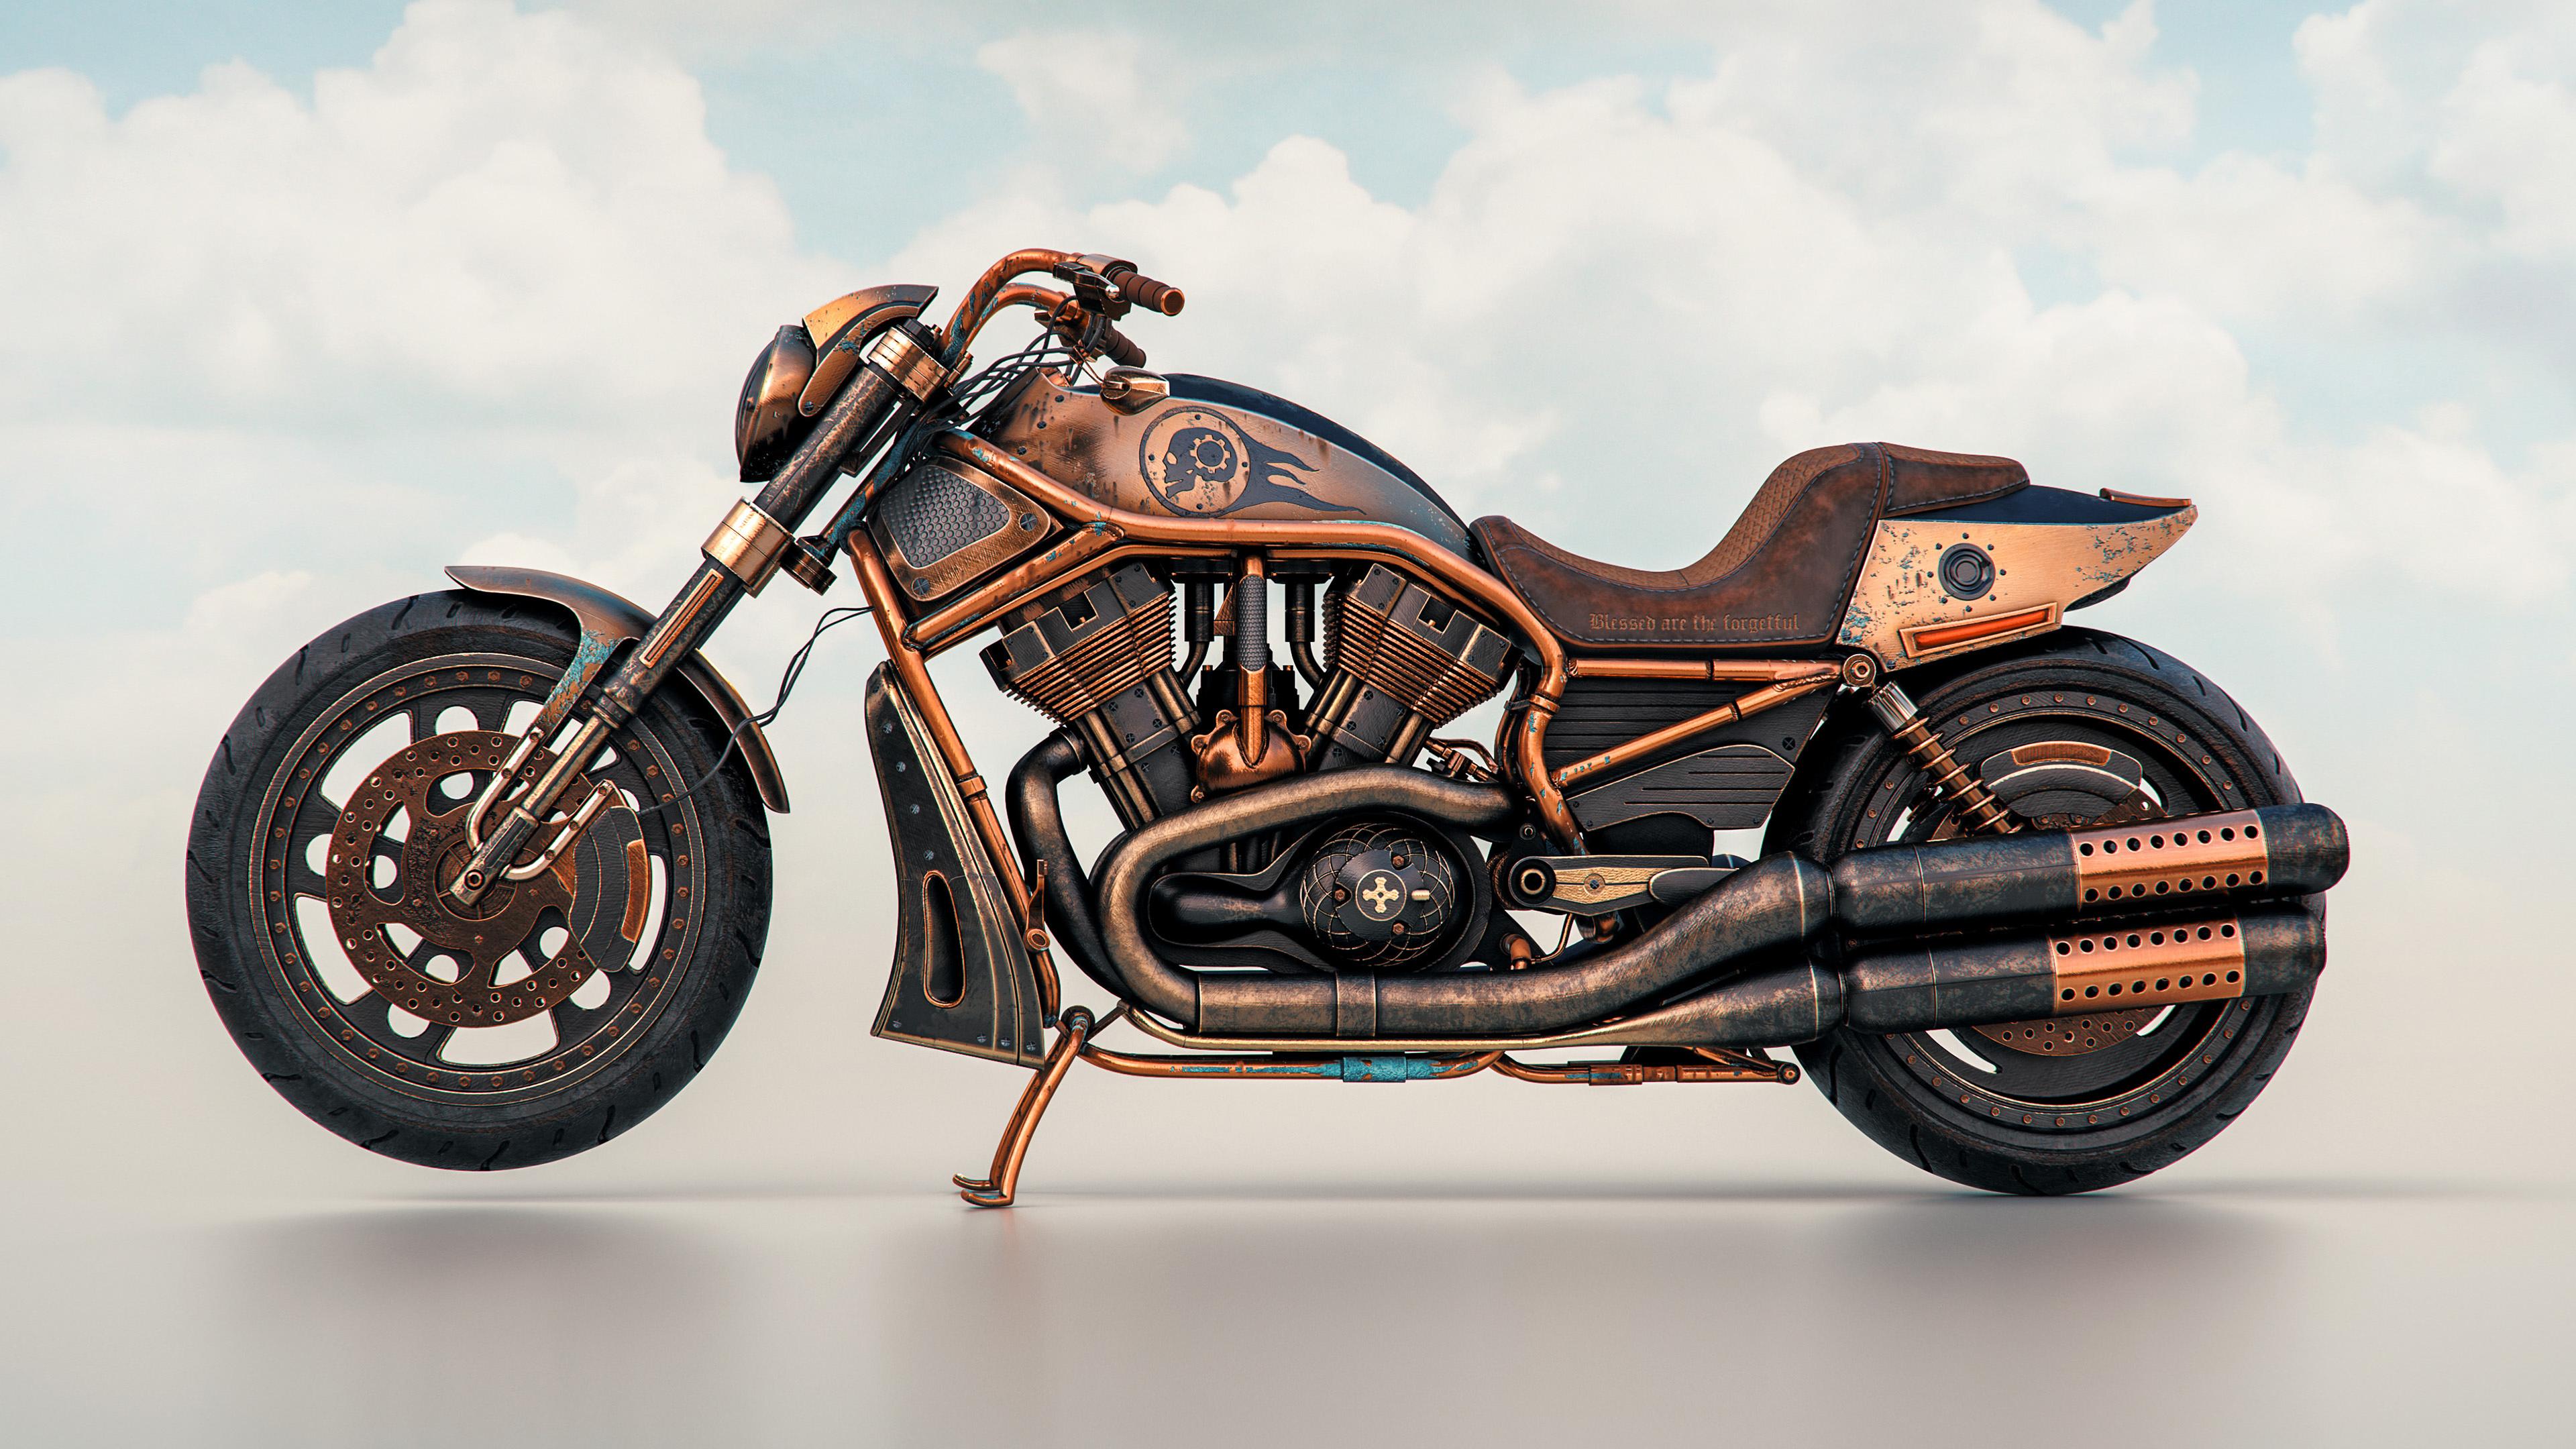 harley davidson night rider steampunk 4k 1540747034 - Harley Davidson Night Rider Steampunk 4k - modified wallpapers, hd-wallpapers, harley davidson wallpapers, bikes wallpapers, behance wallpapers, 4k-wallpapers